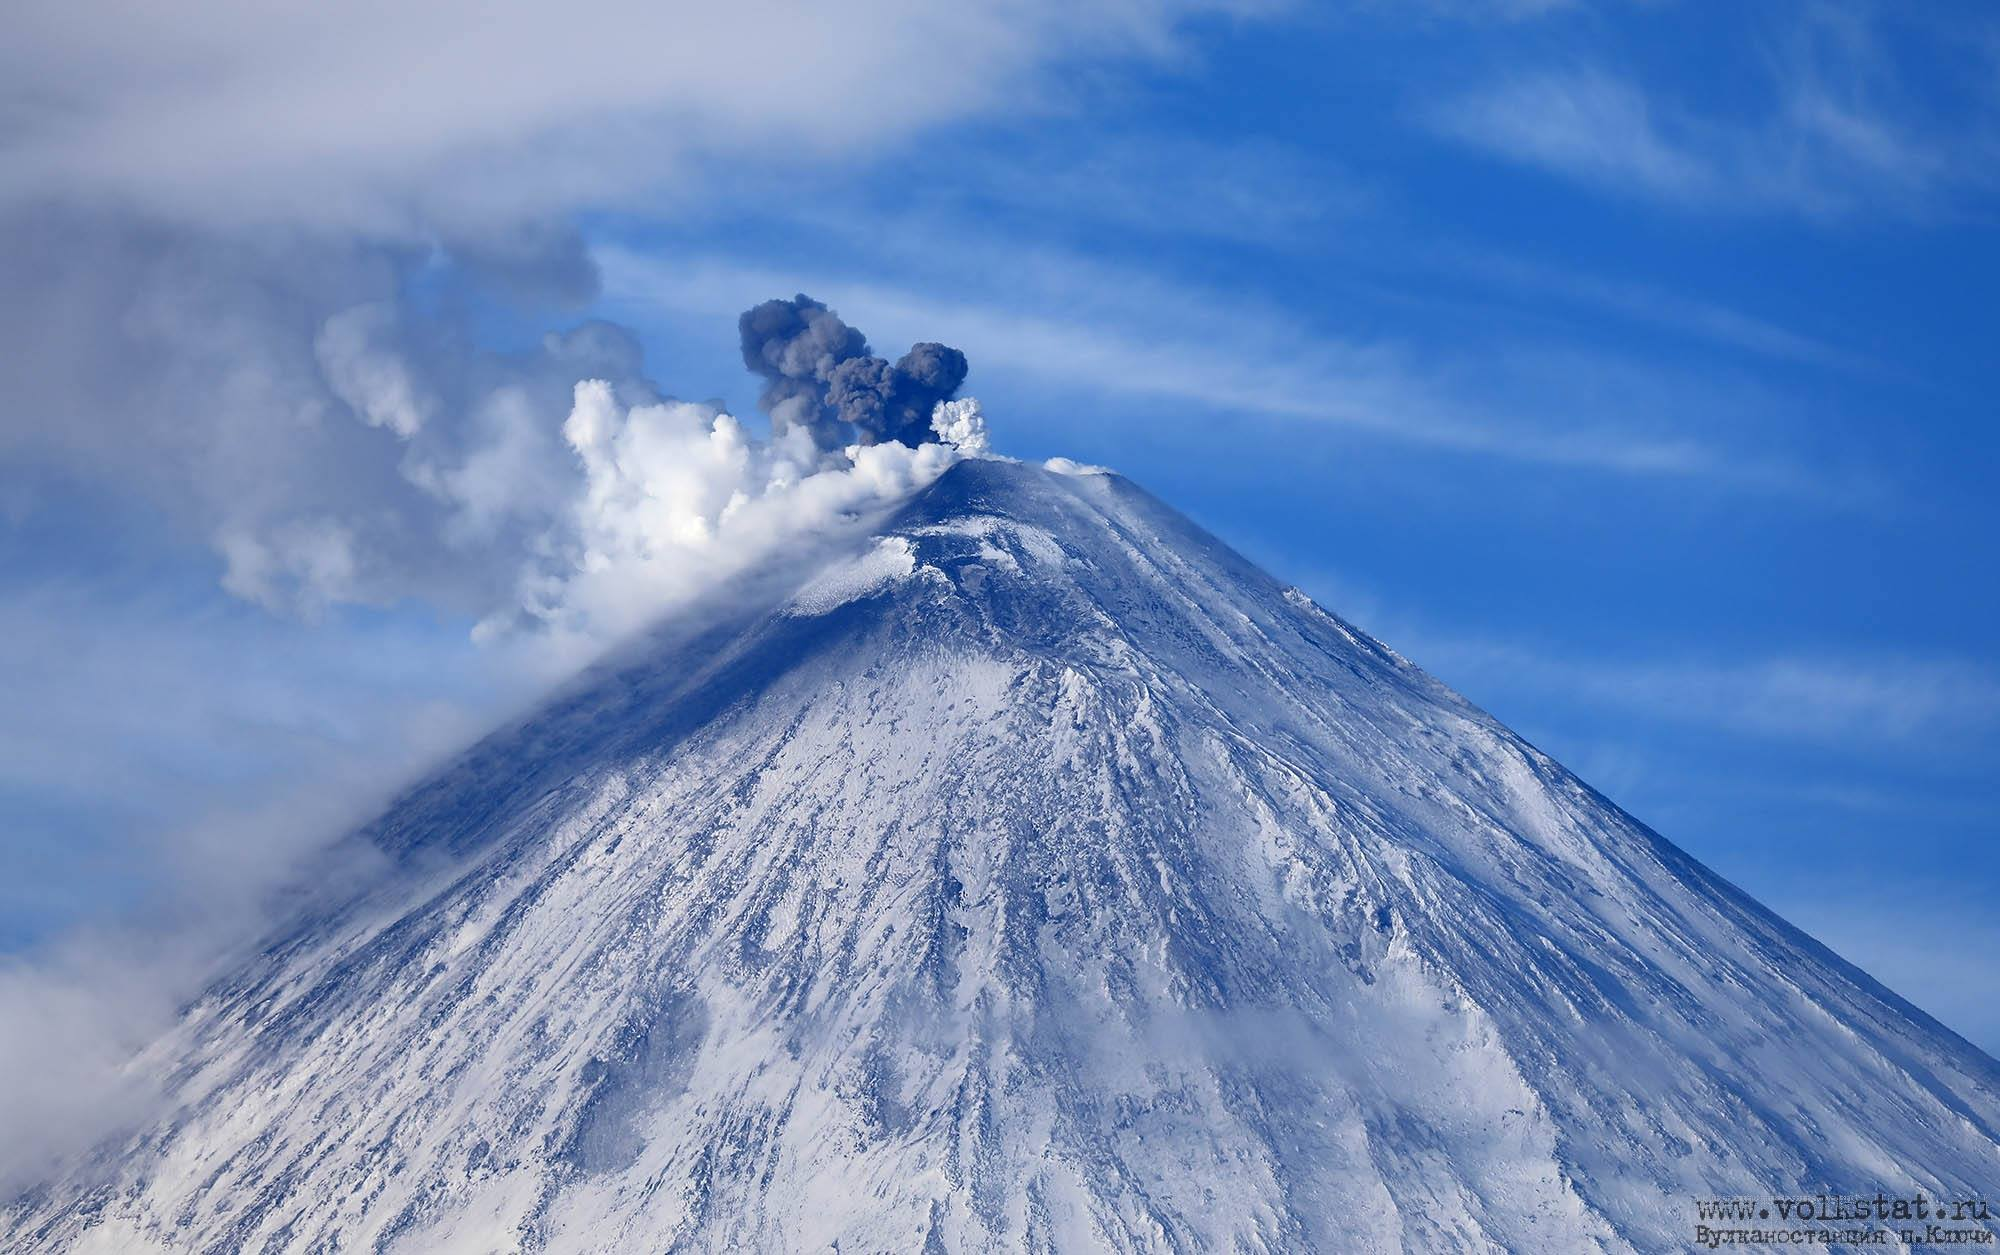 May 18, 2020. EN. Kamchatka : Klyuchevskoy , Italy / Sicily: Etna , Guatemala : Fuego , Indonesia : Anak Krakatau , Mexico : Colima .